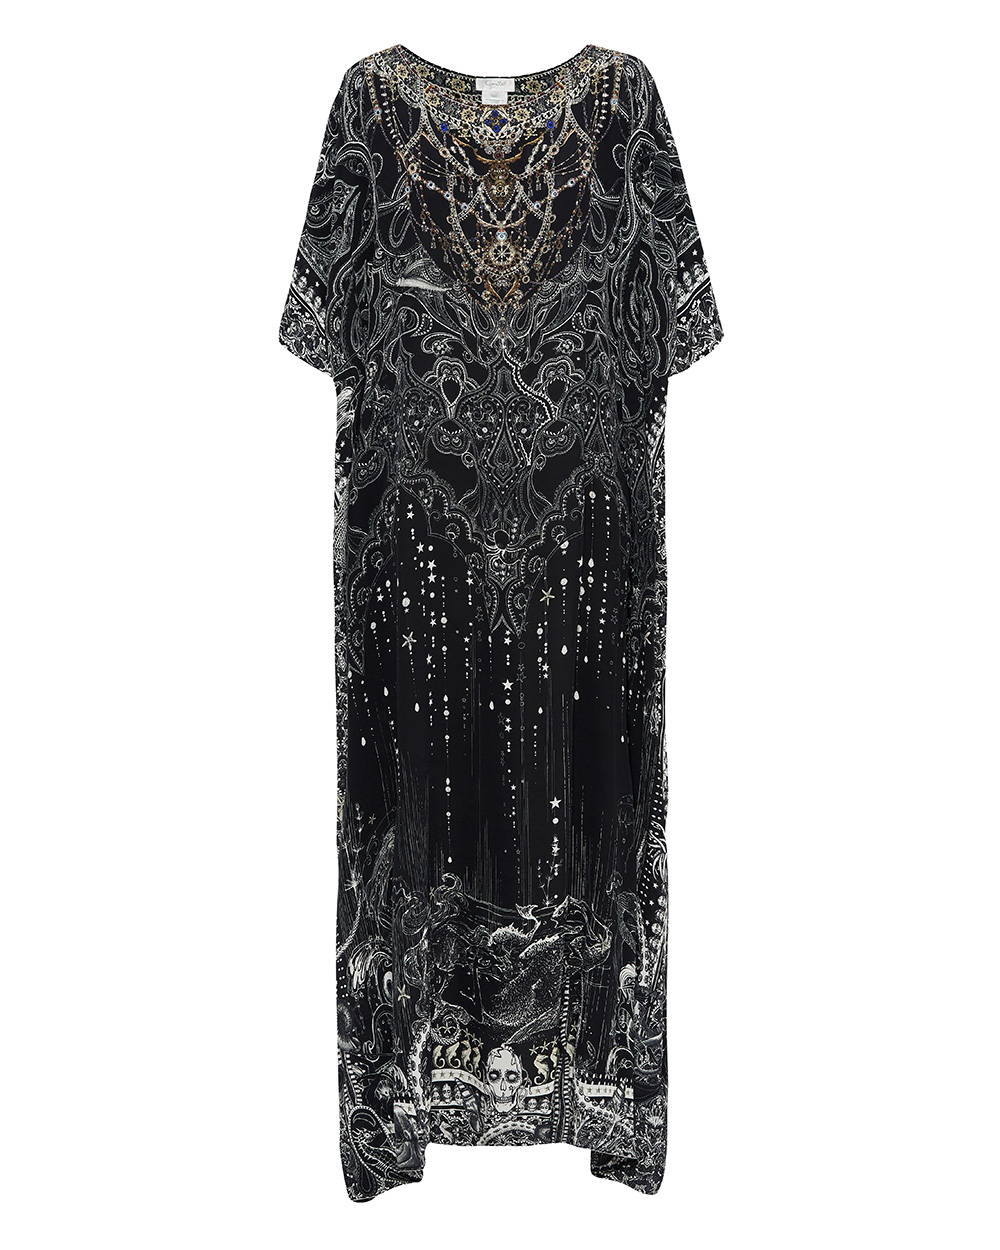 CAMILLA black and silver embellished kaftan